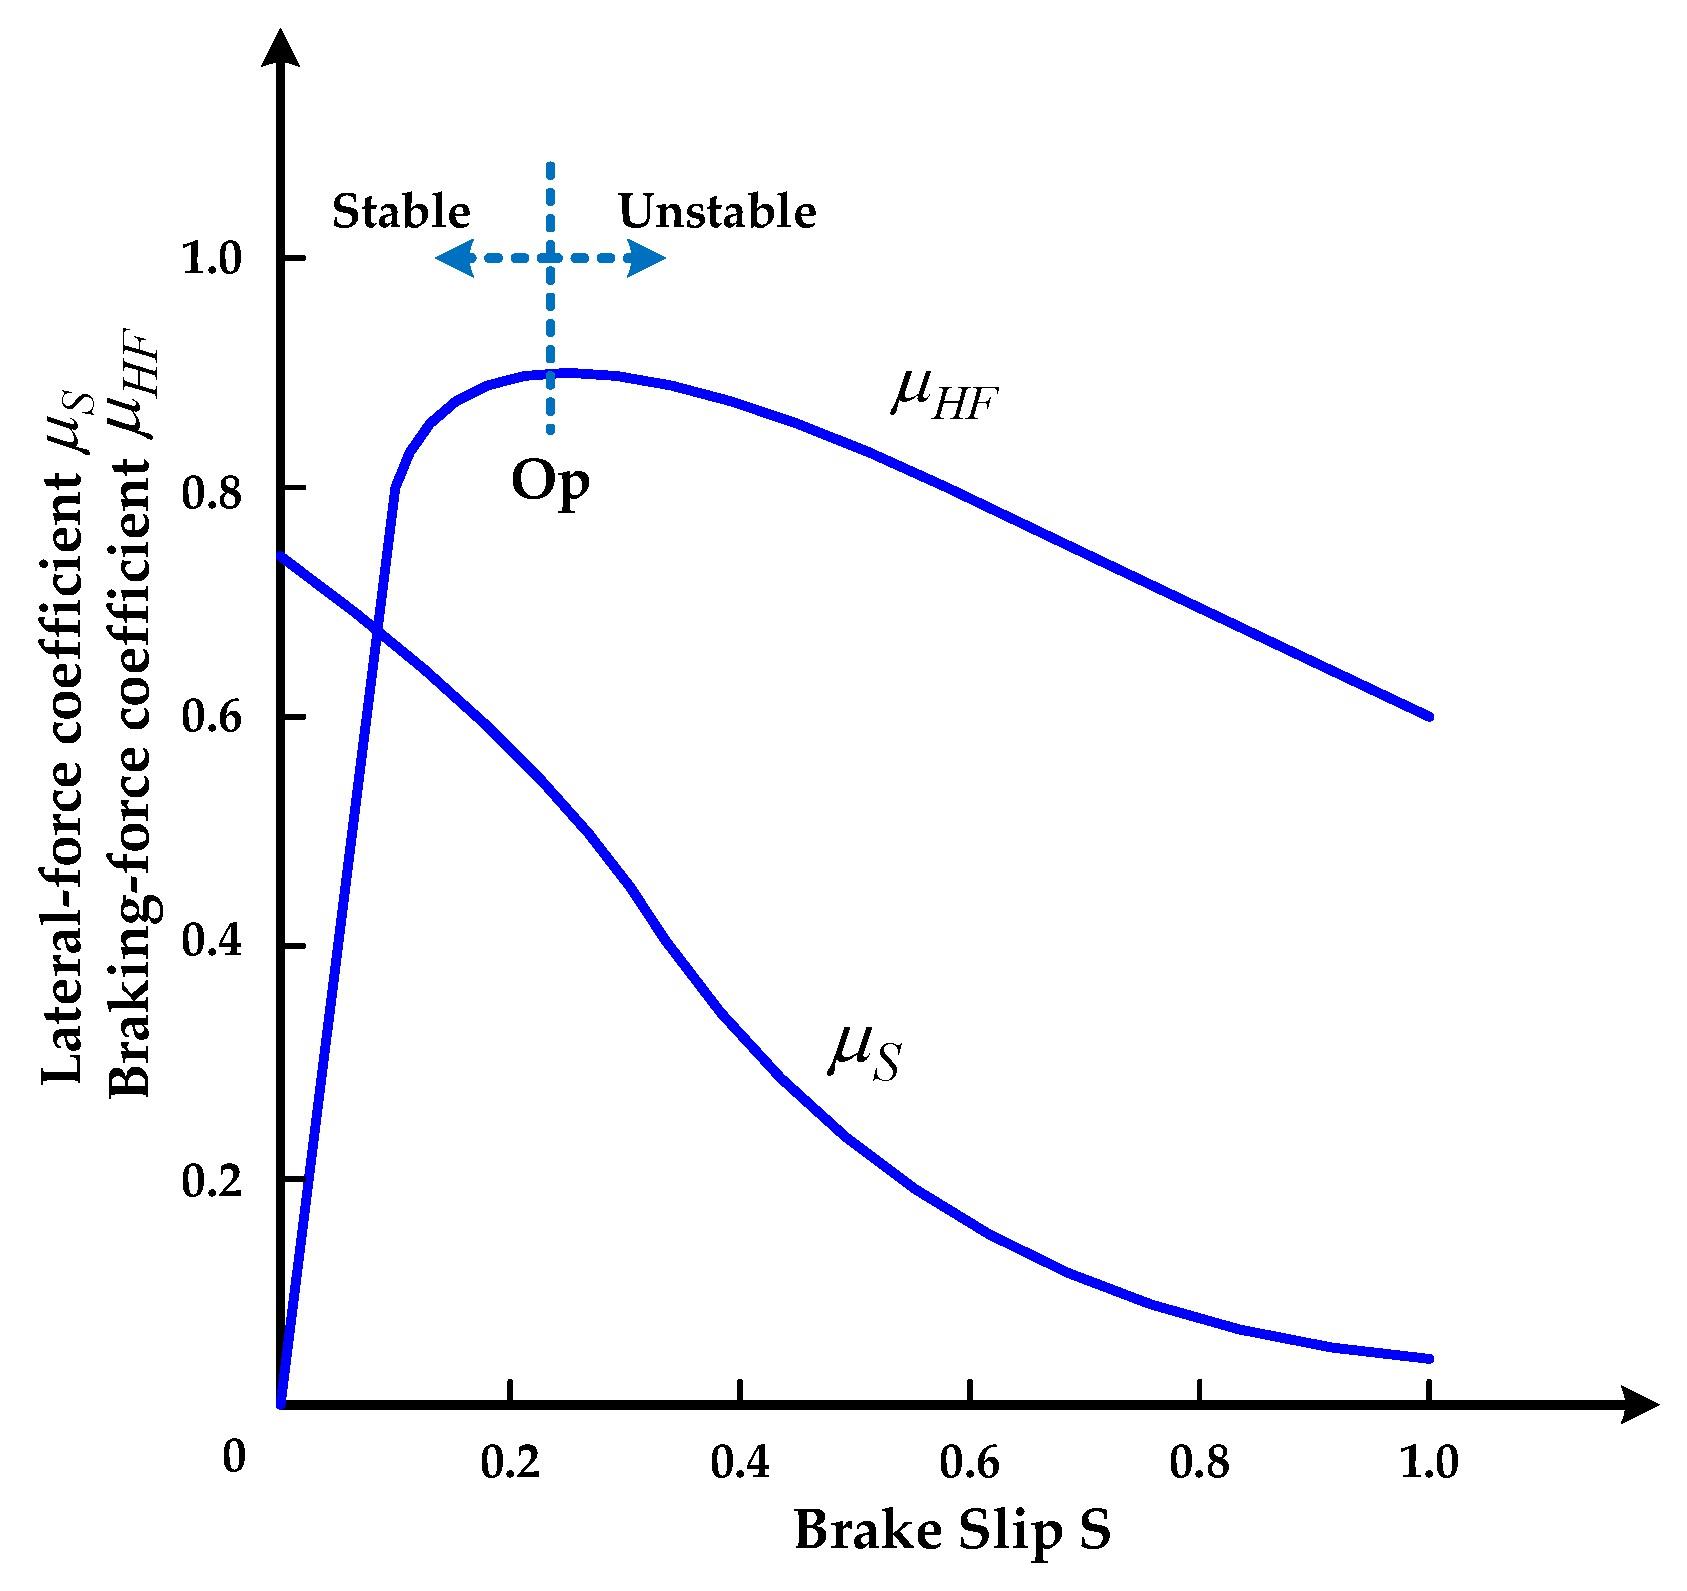 Regenerative Braking Diagram Actuators Free Full Text Of Regenerative Braking Diagram